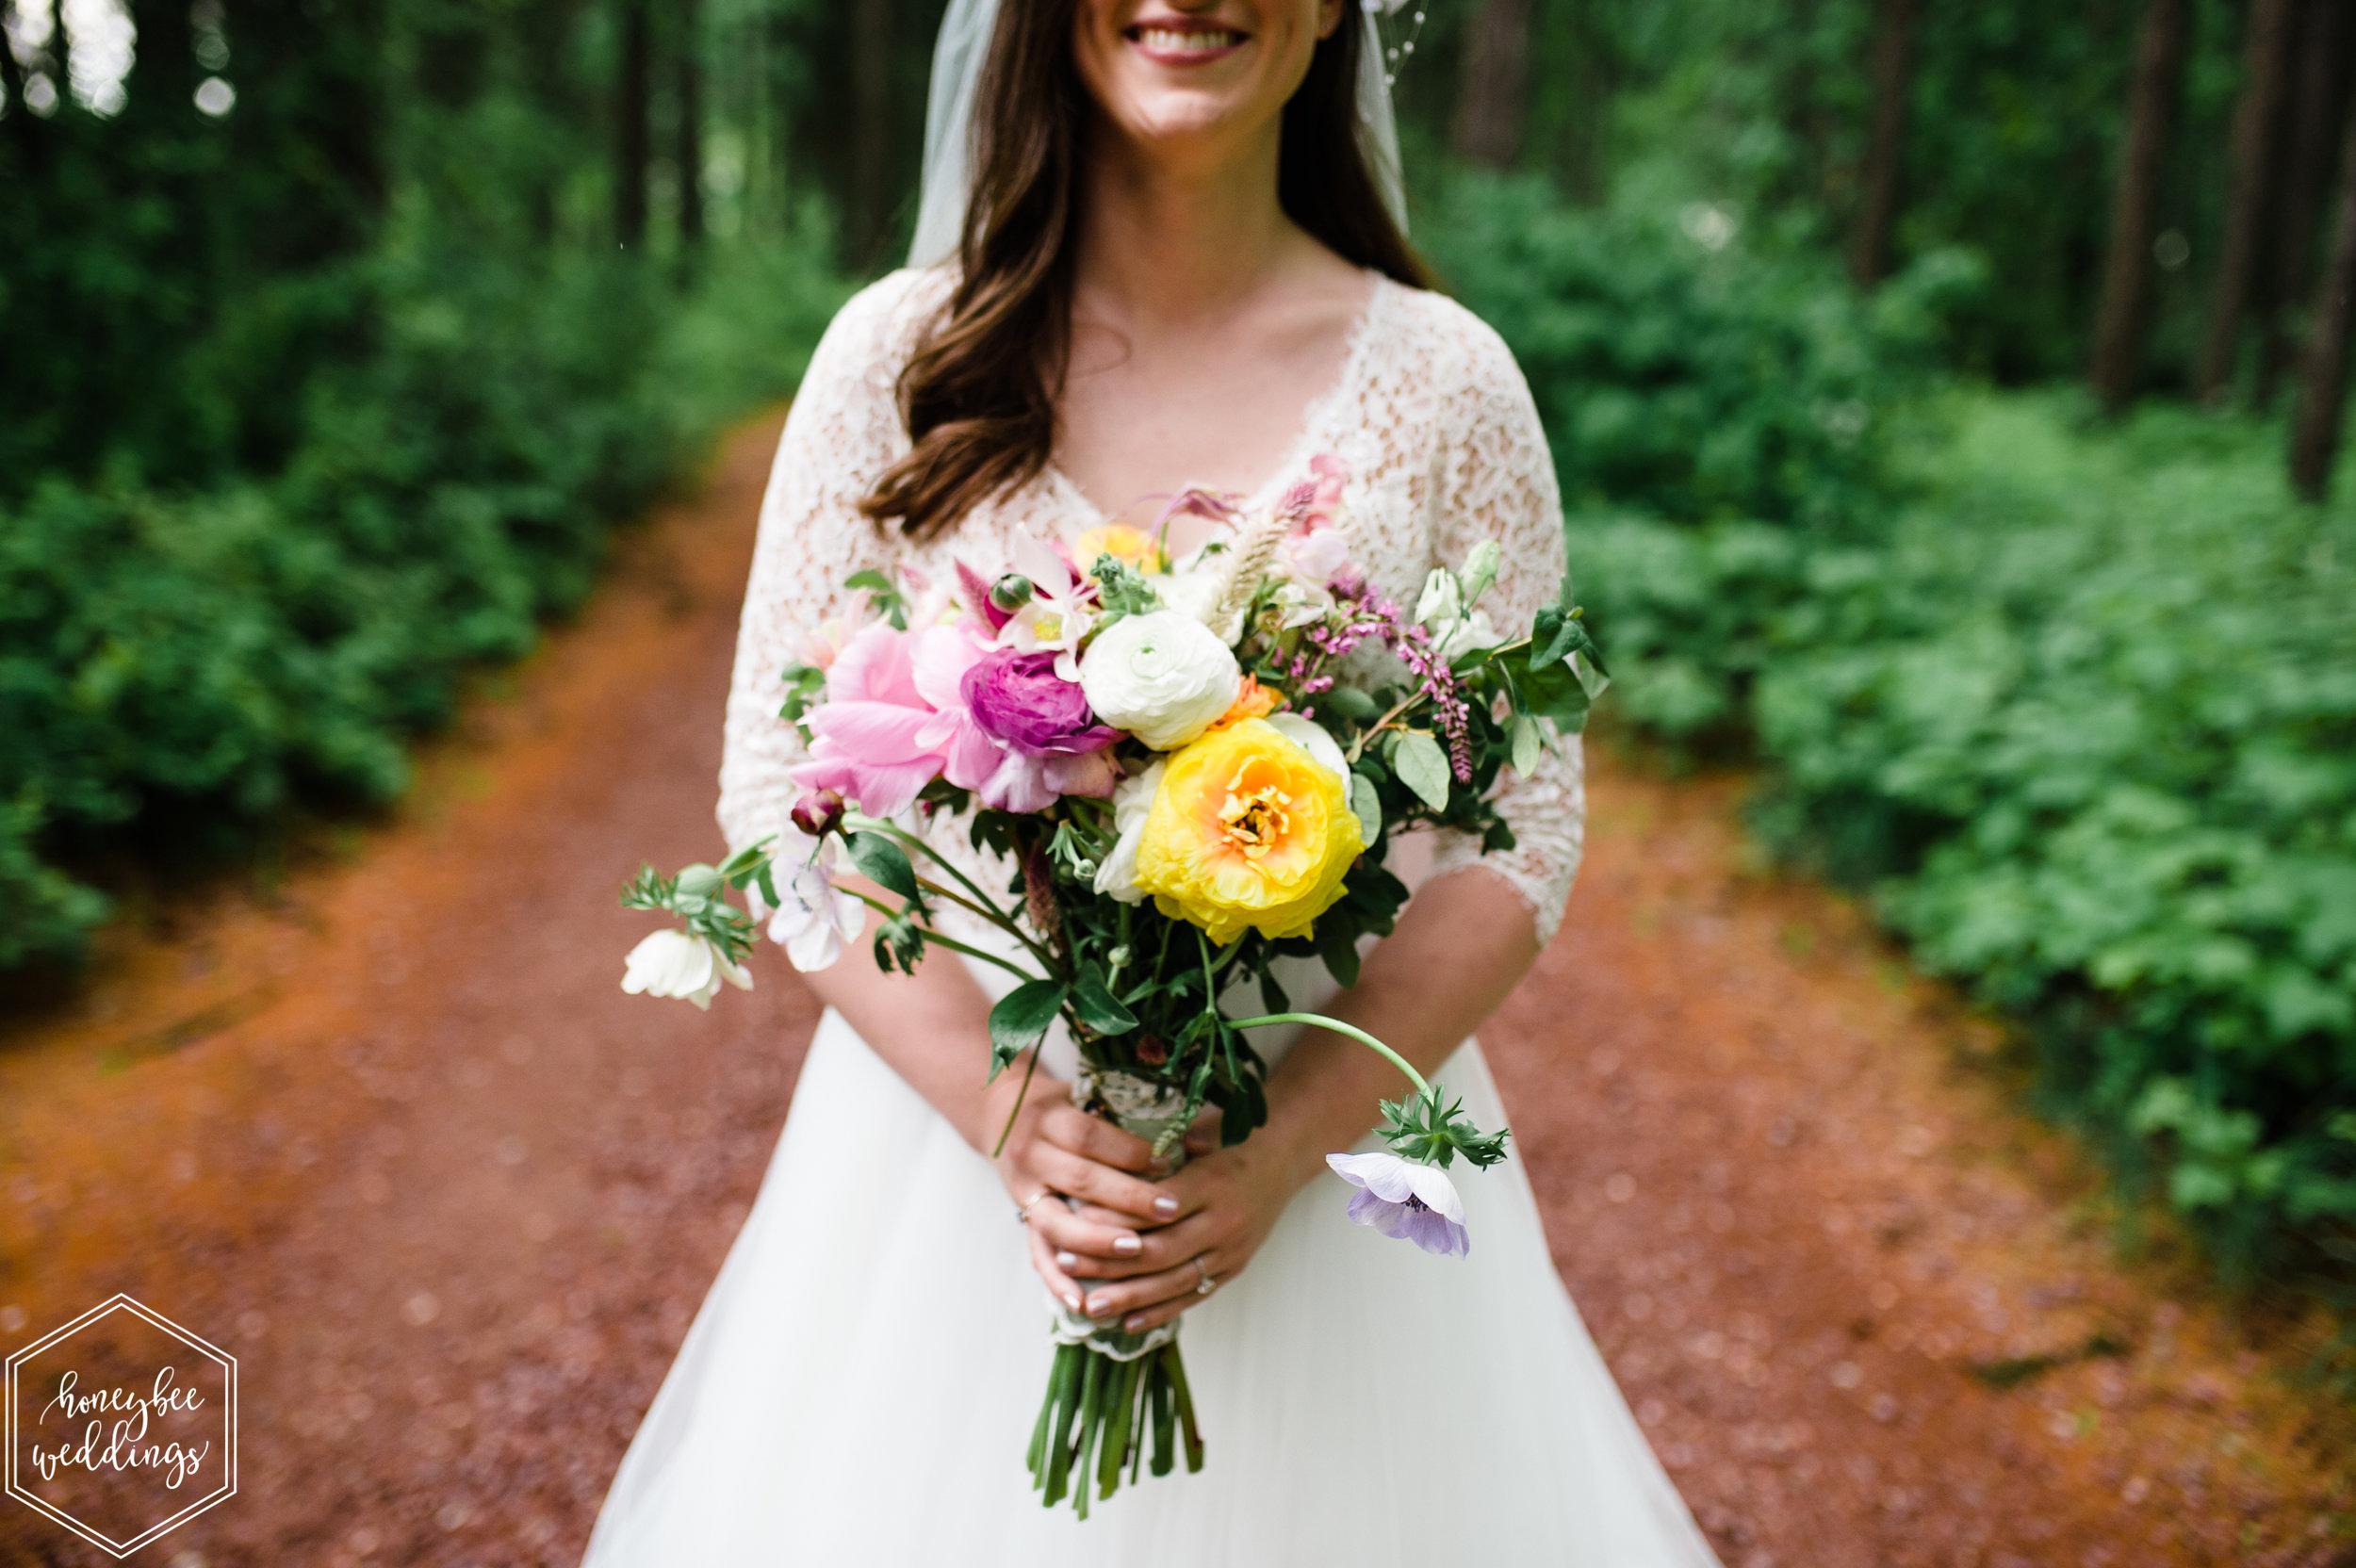 020Glacier National Park Wedding_Izaak Walton Inn Wedding_Honeybee Weddings_Norah & Kyle_June 08, 2019-237.jpg